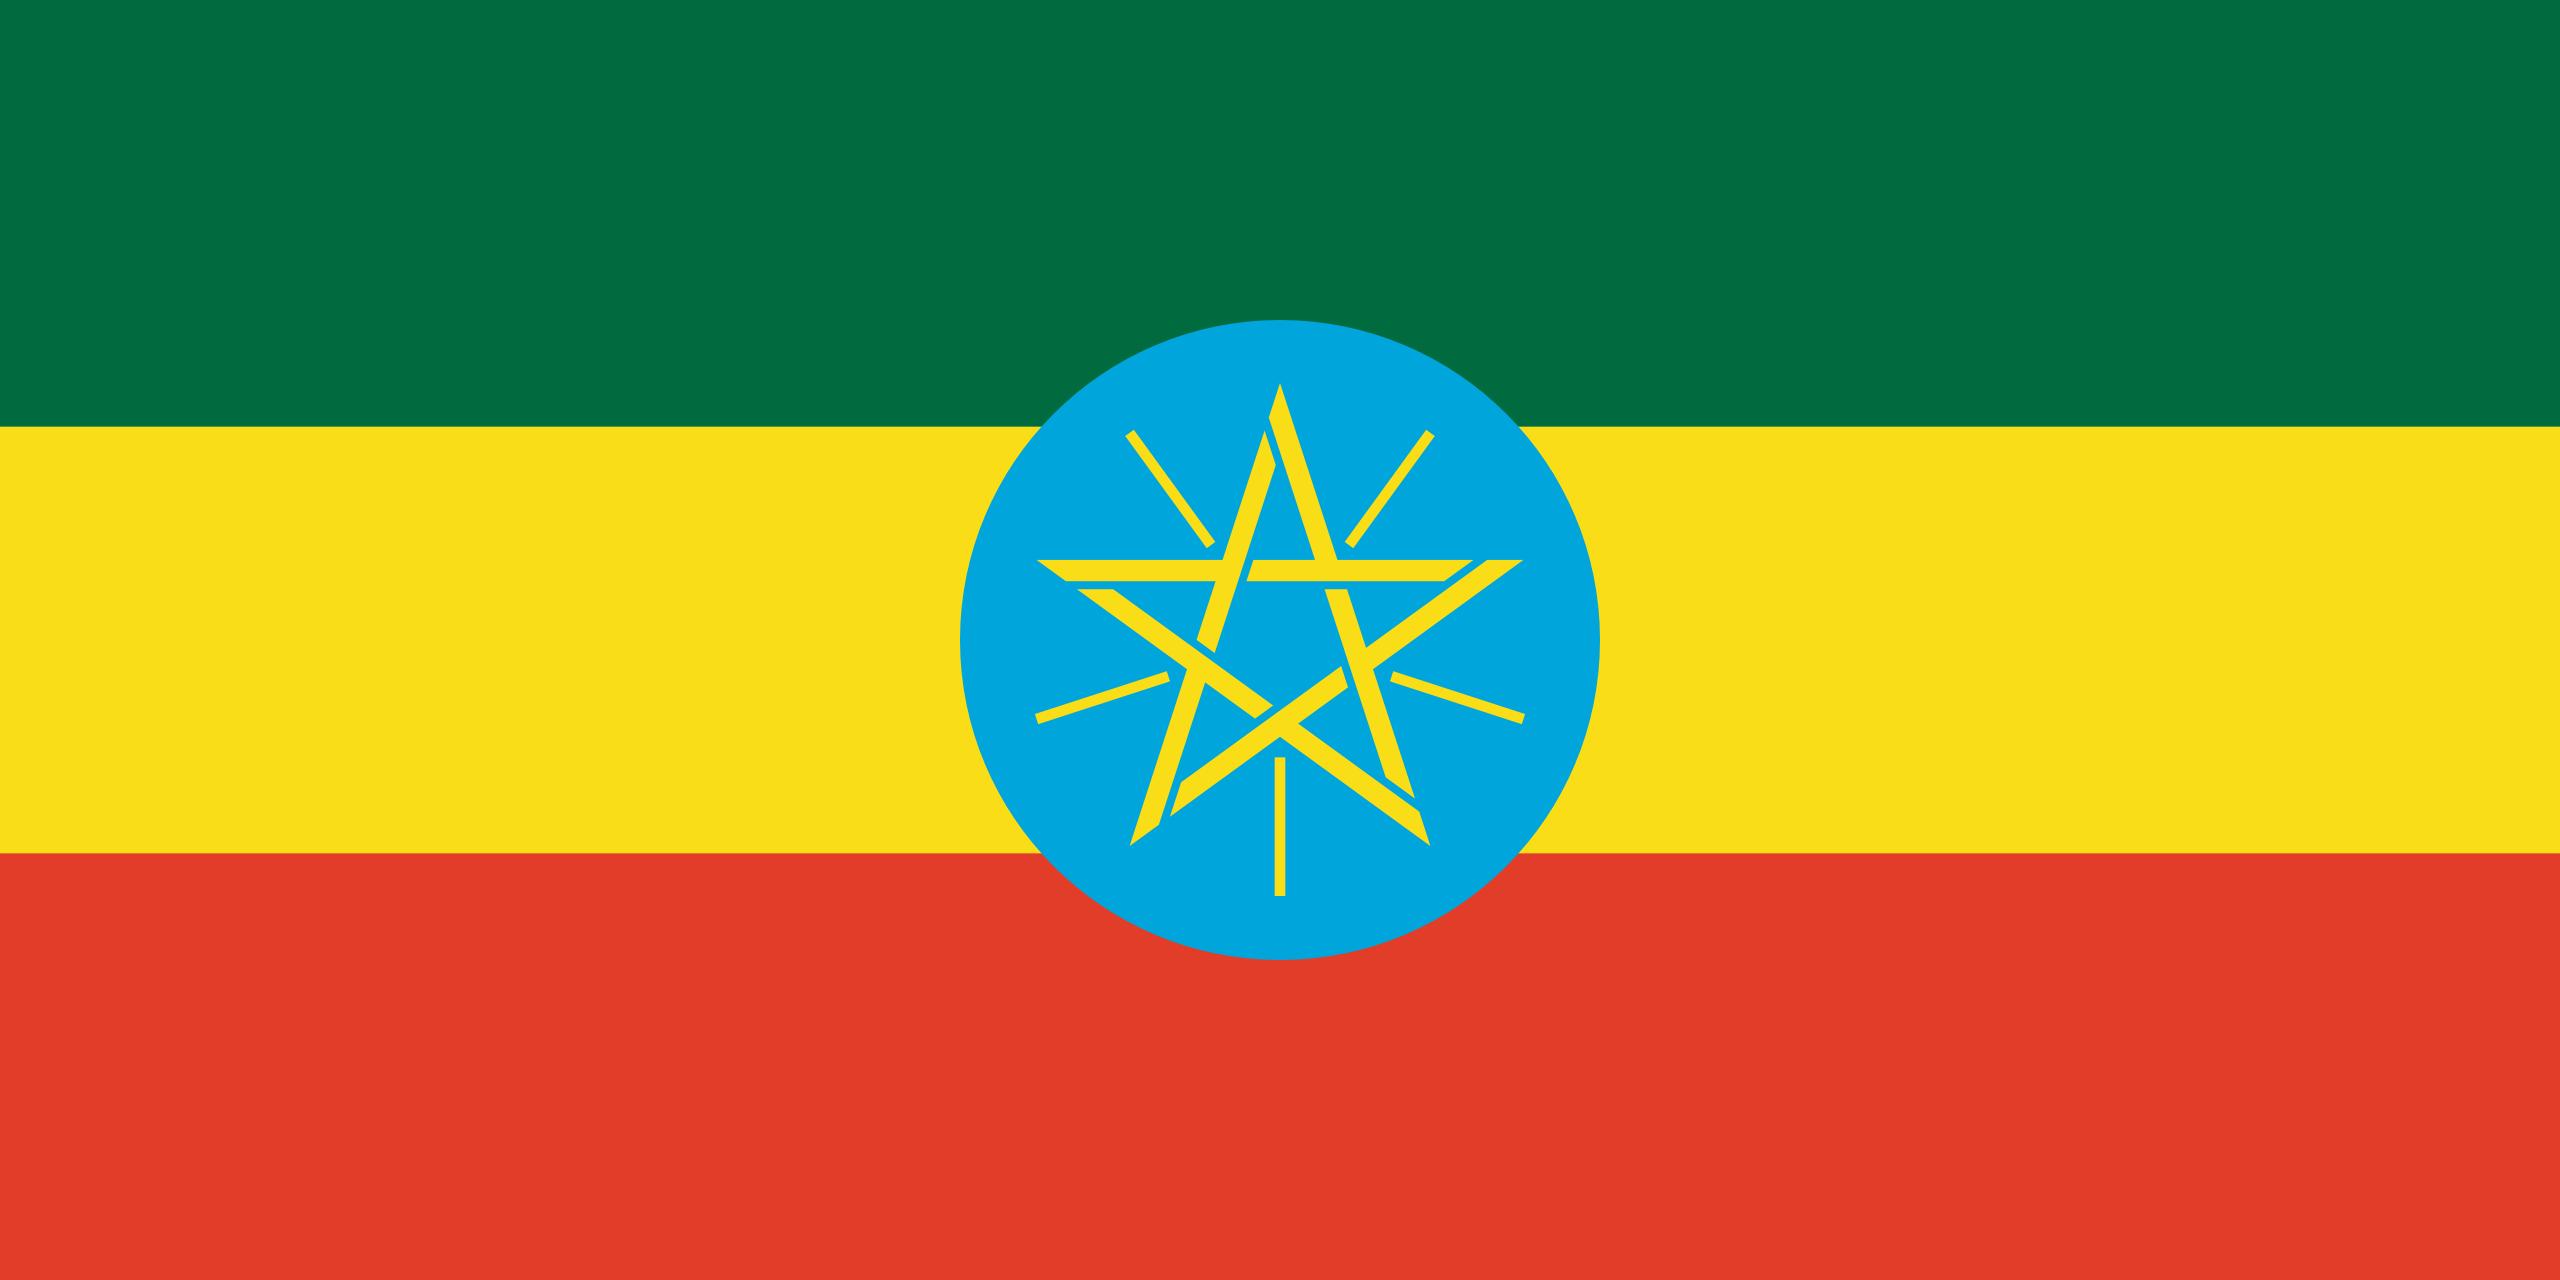 etiopía, paese, emblema, logo, simbolo - Sfondi HD - Professor-falken.com